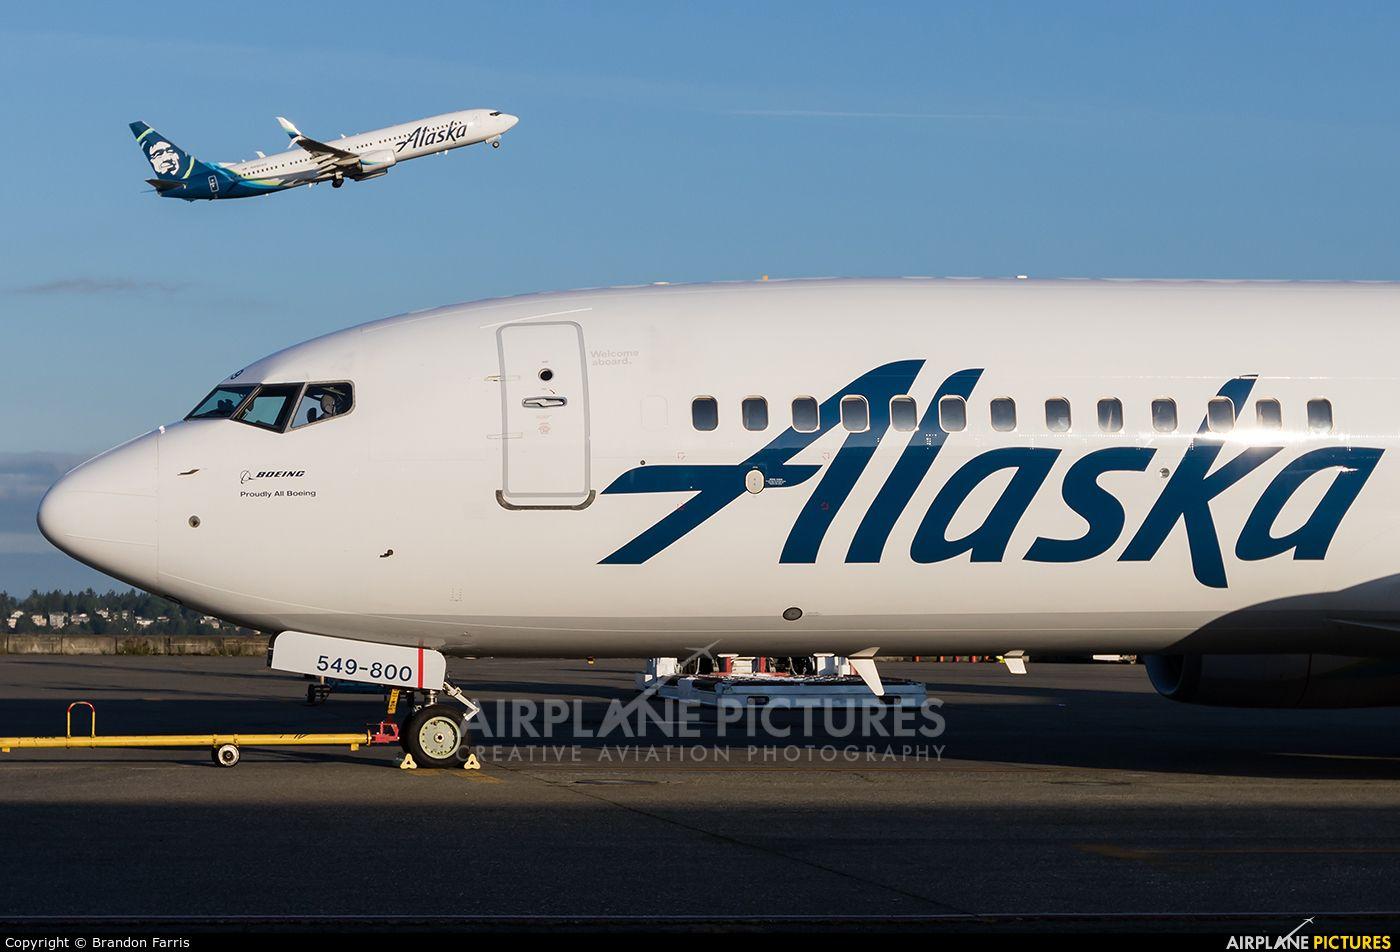 Alaska Airlines Boeing 737800 photo by Brandon Farris